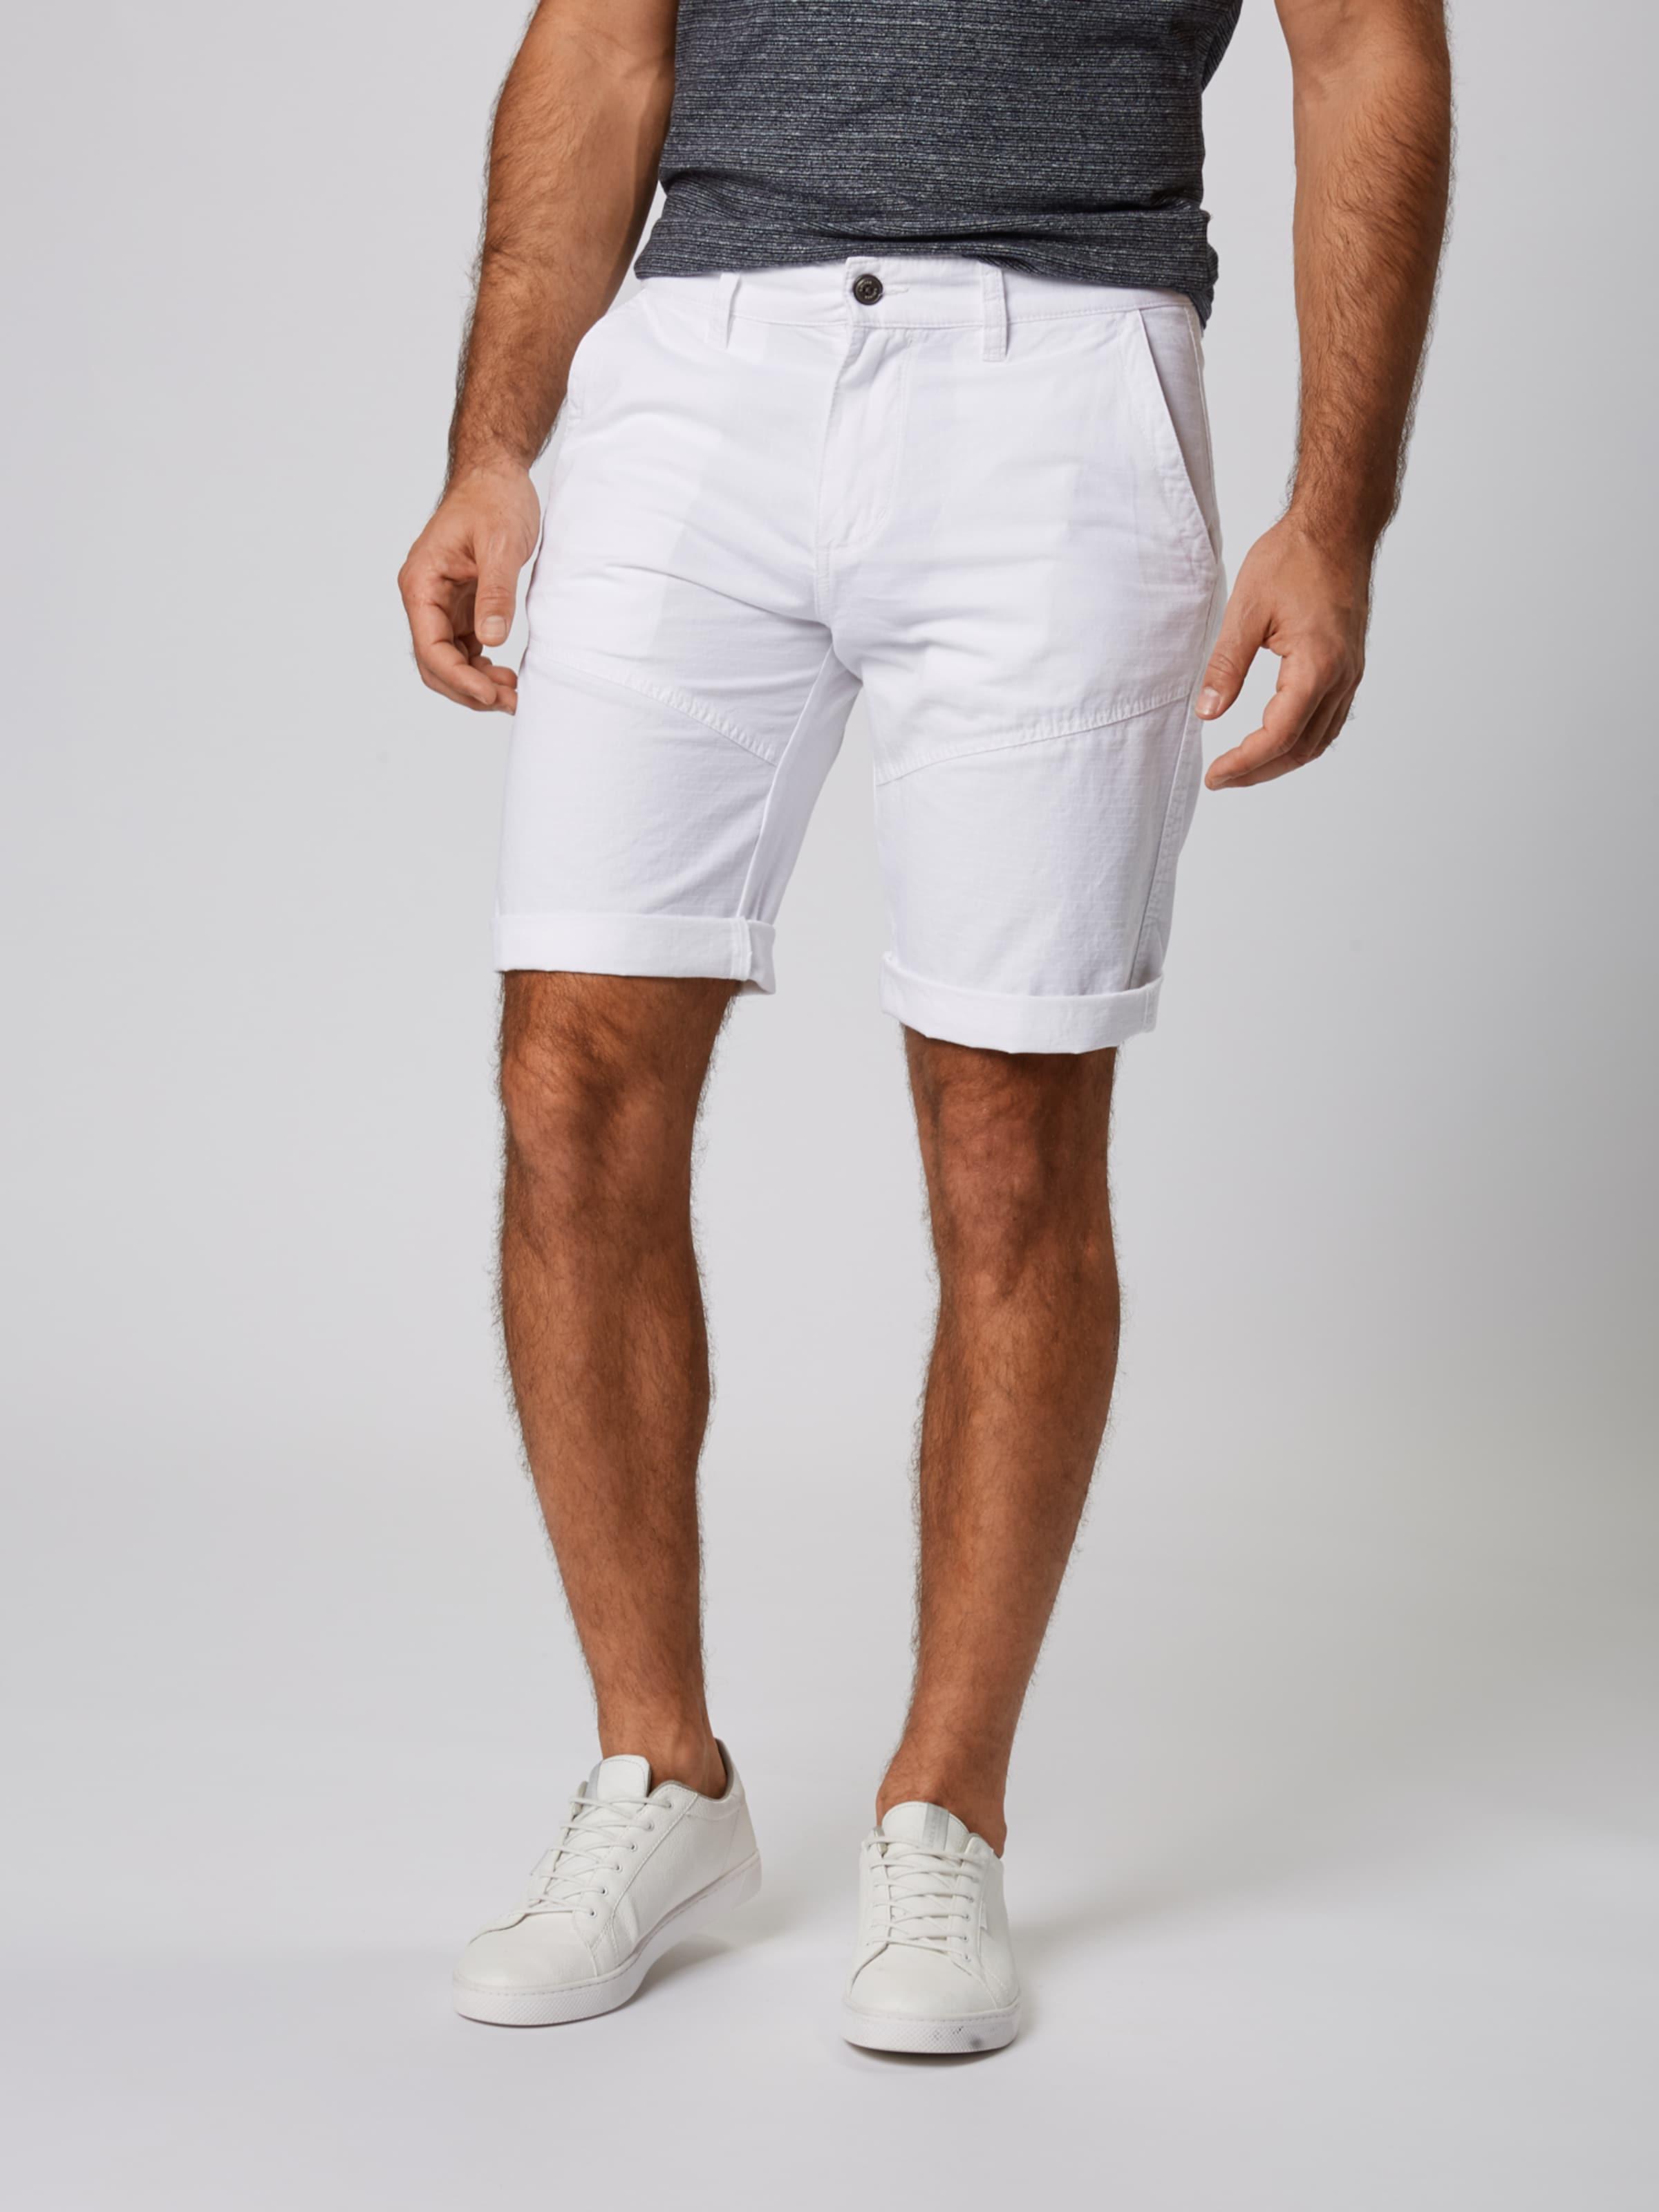 Shorts Label S Weiß oliver Red In lK1JcFT